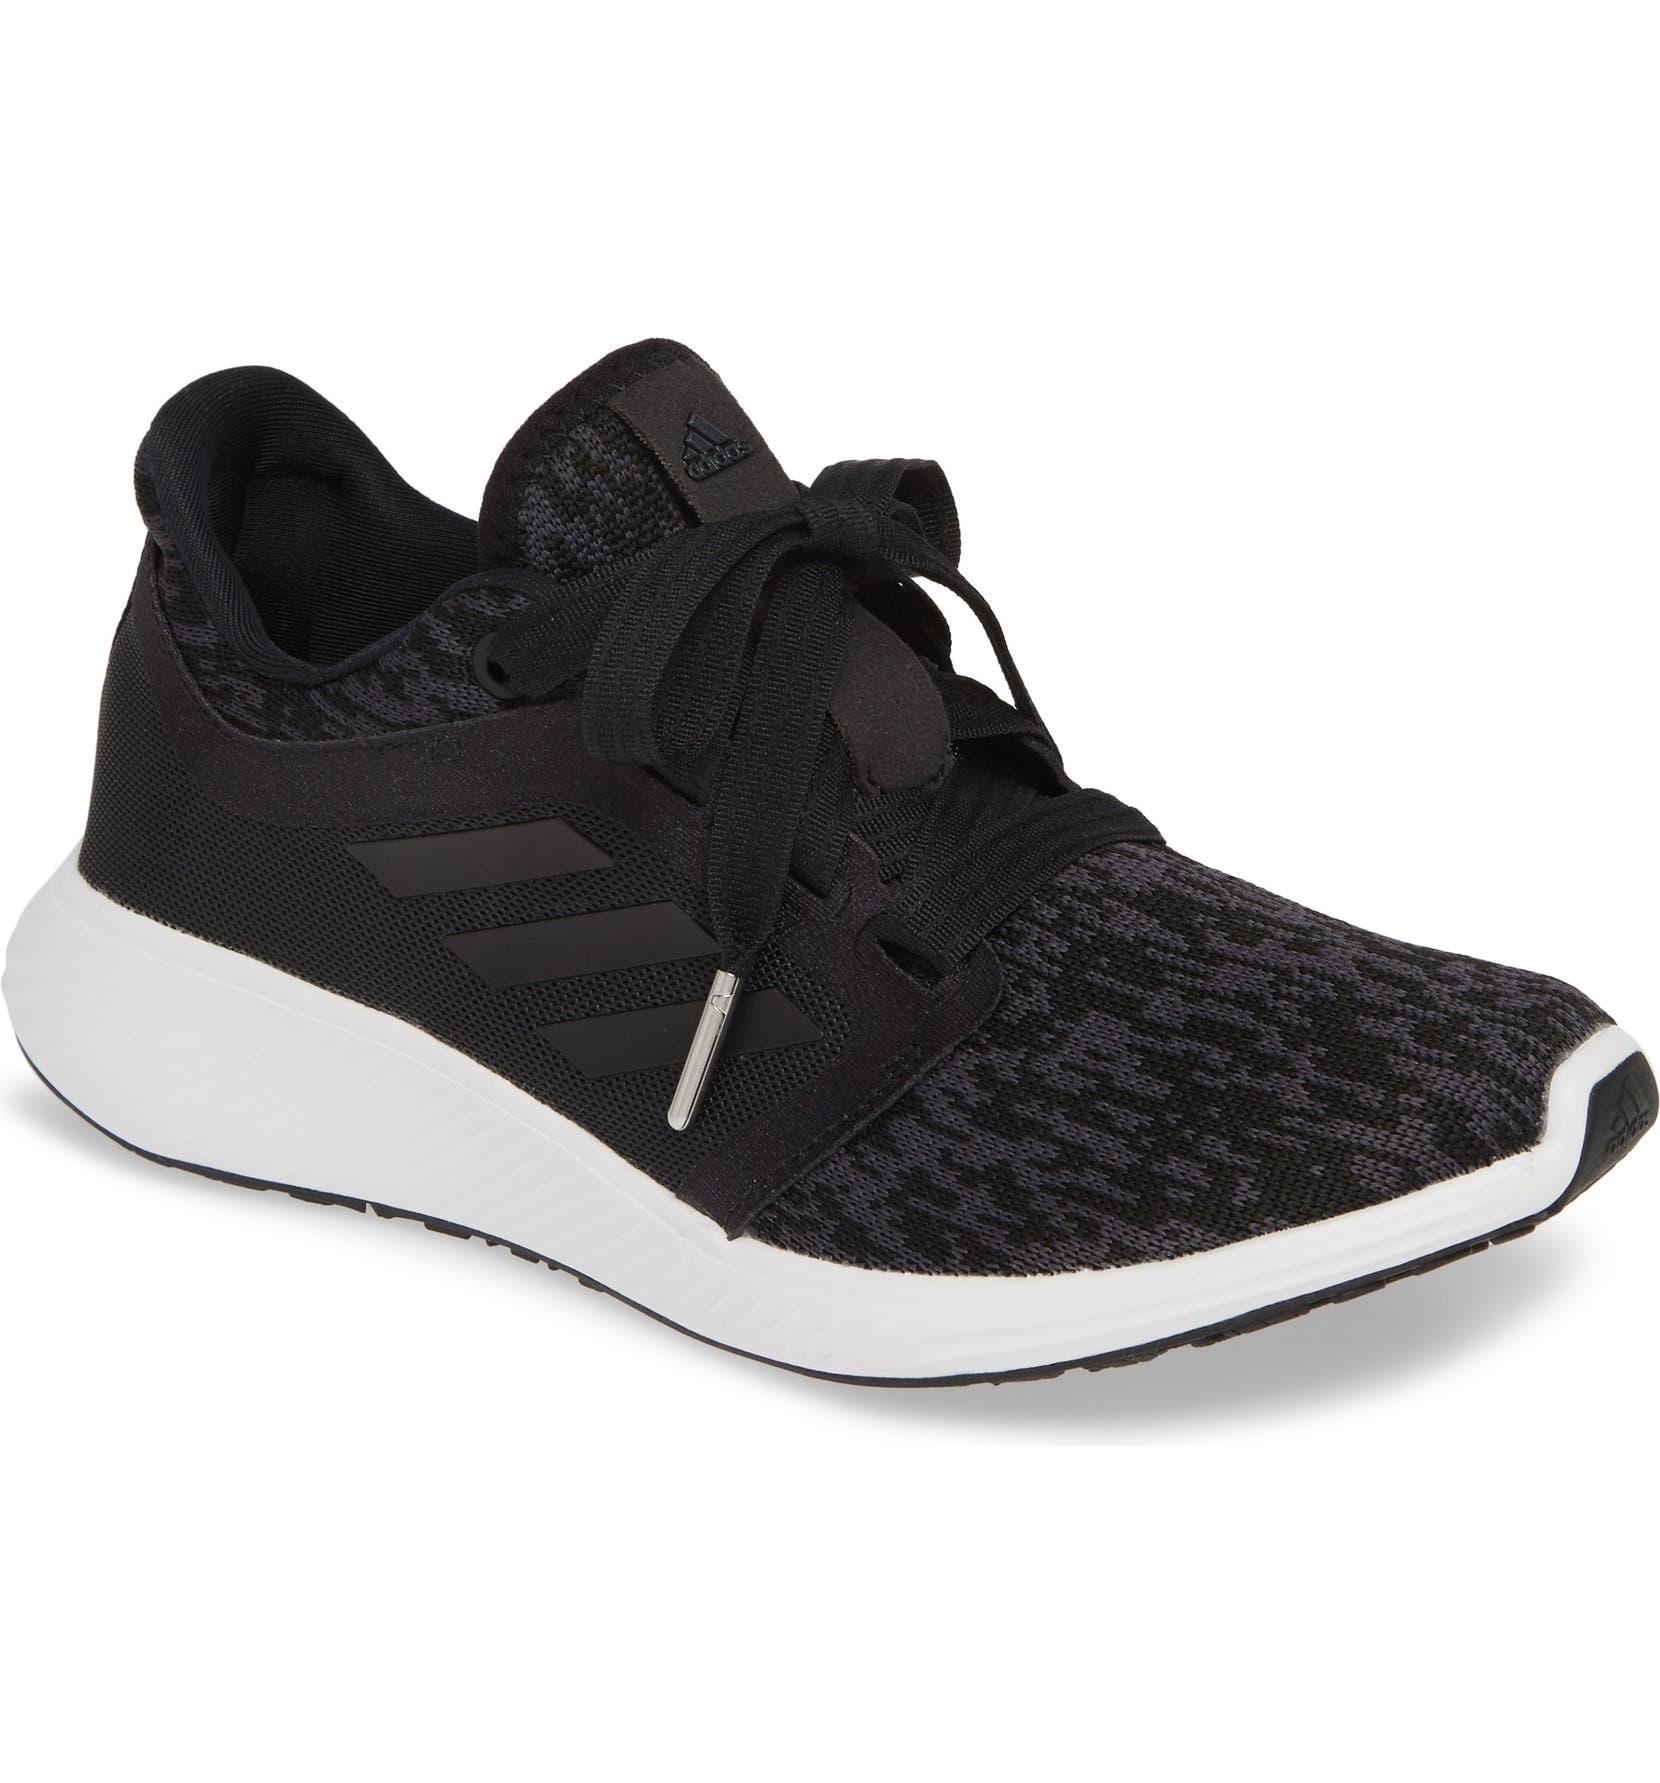 a5ee8fe2213 adidas Edge Lux 3 Running Shoe (Women)